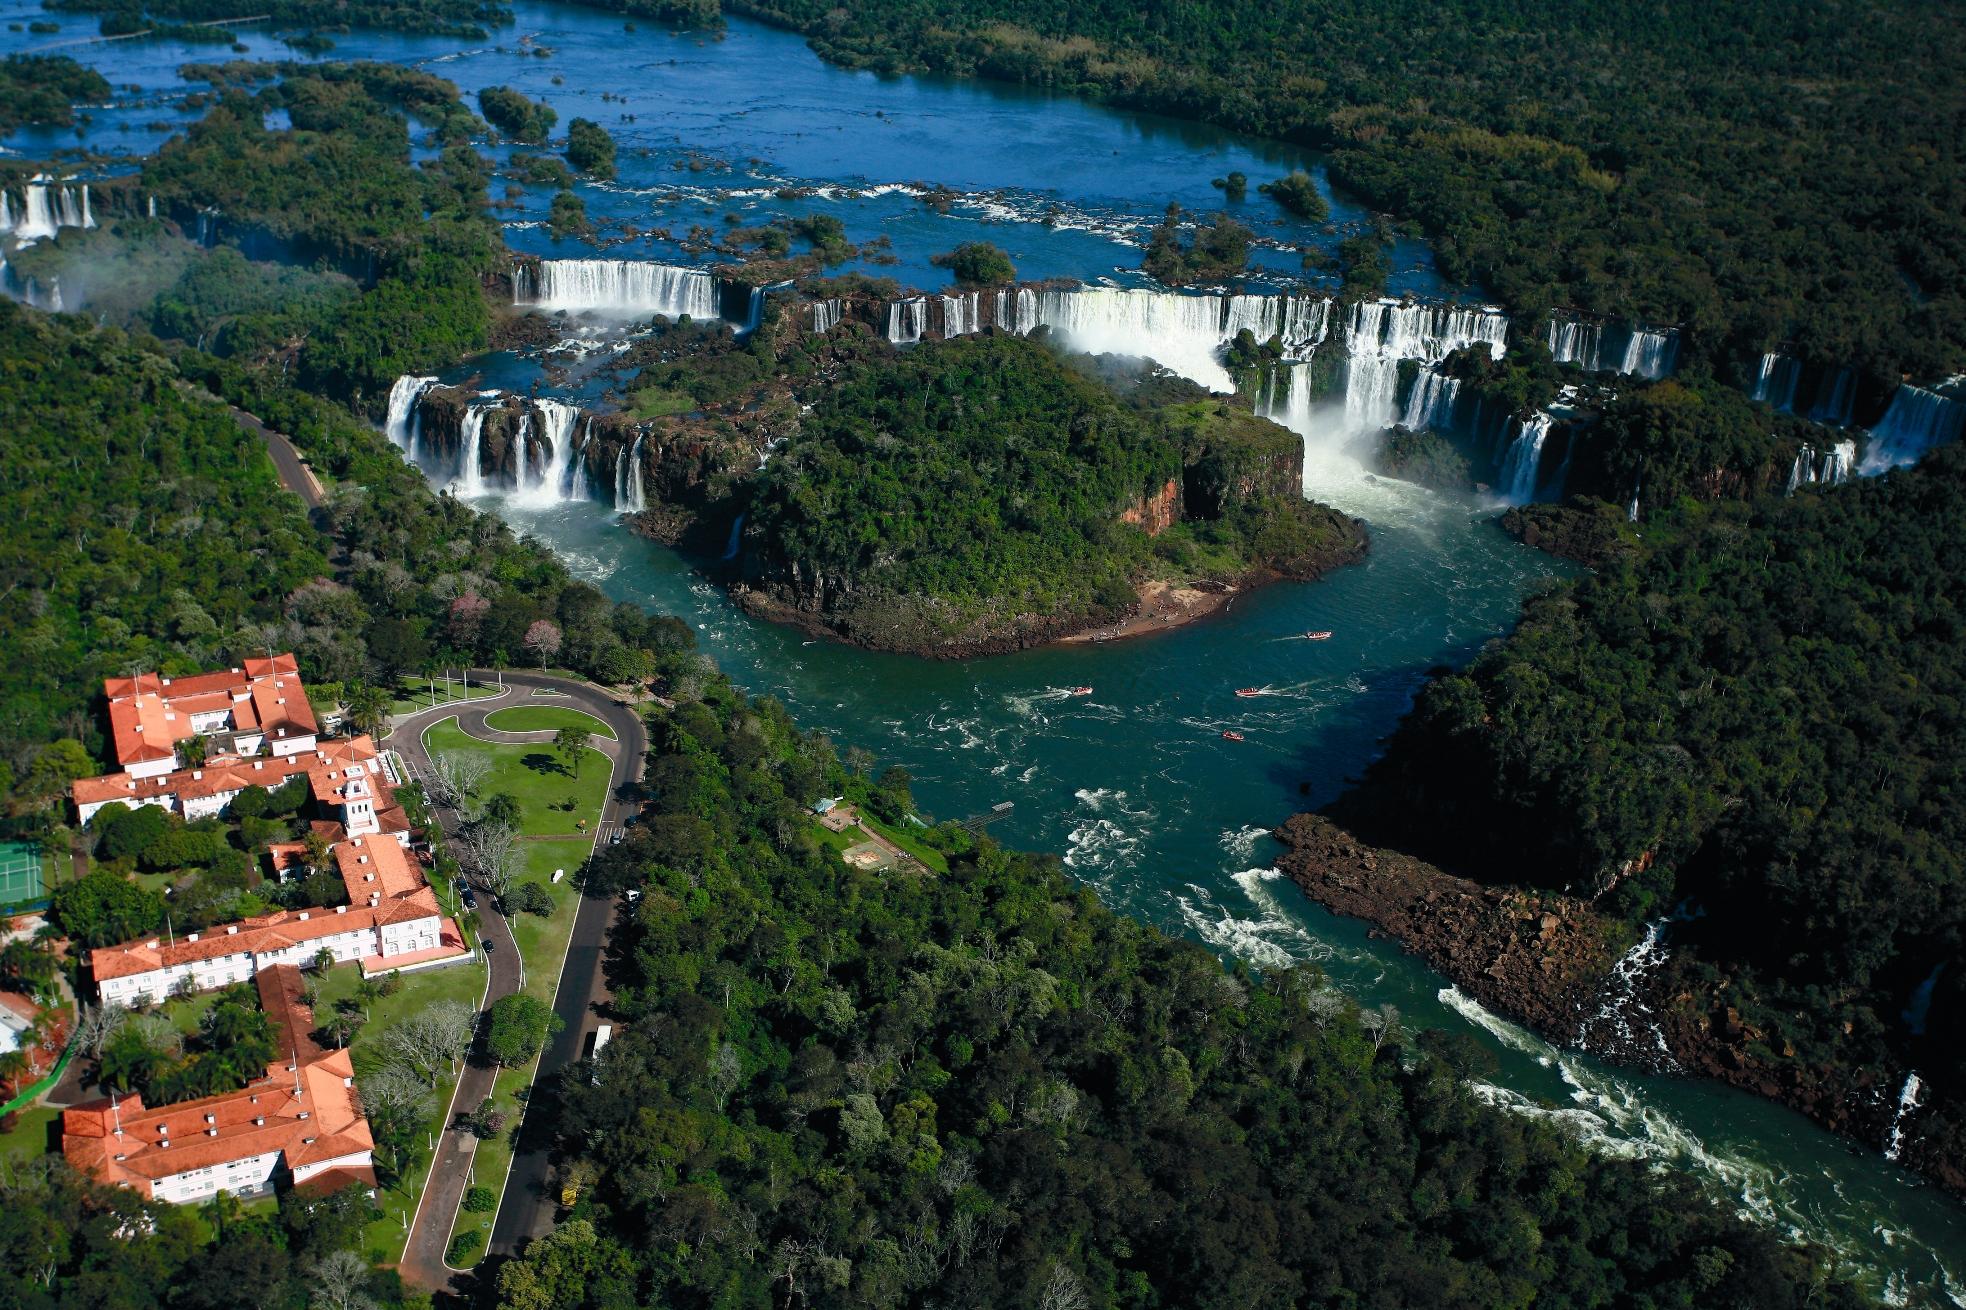 Belmond Das Cataratas, Iguassu Falls